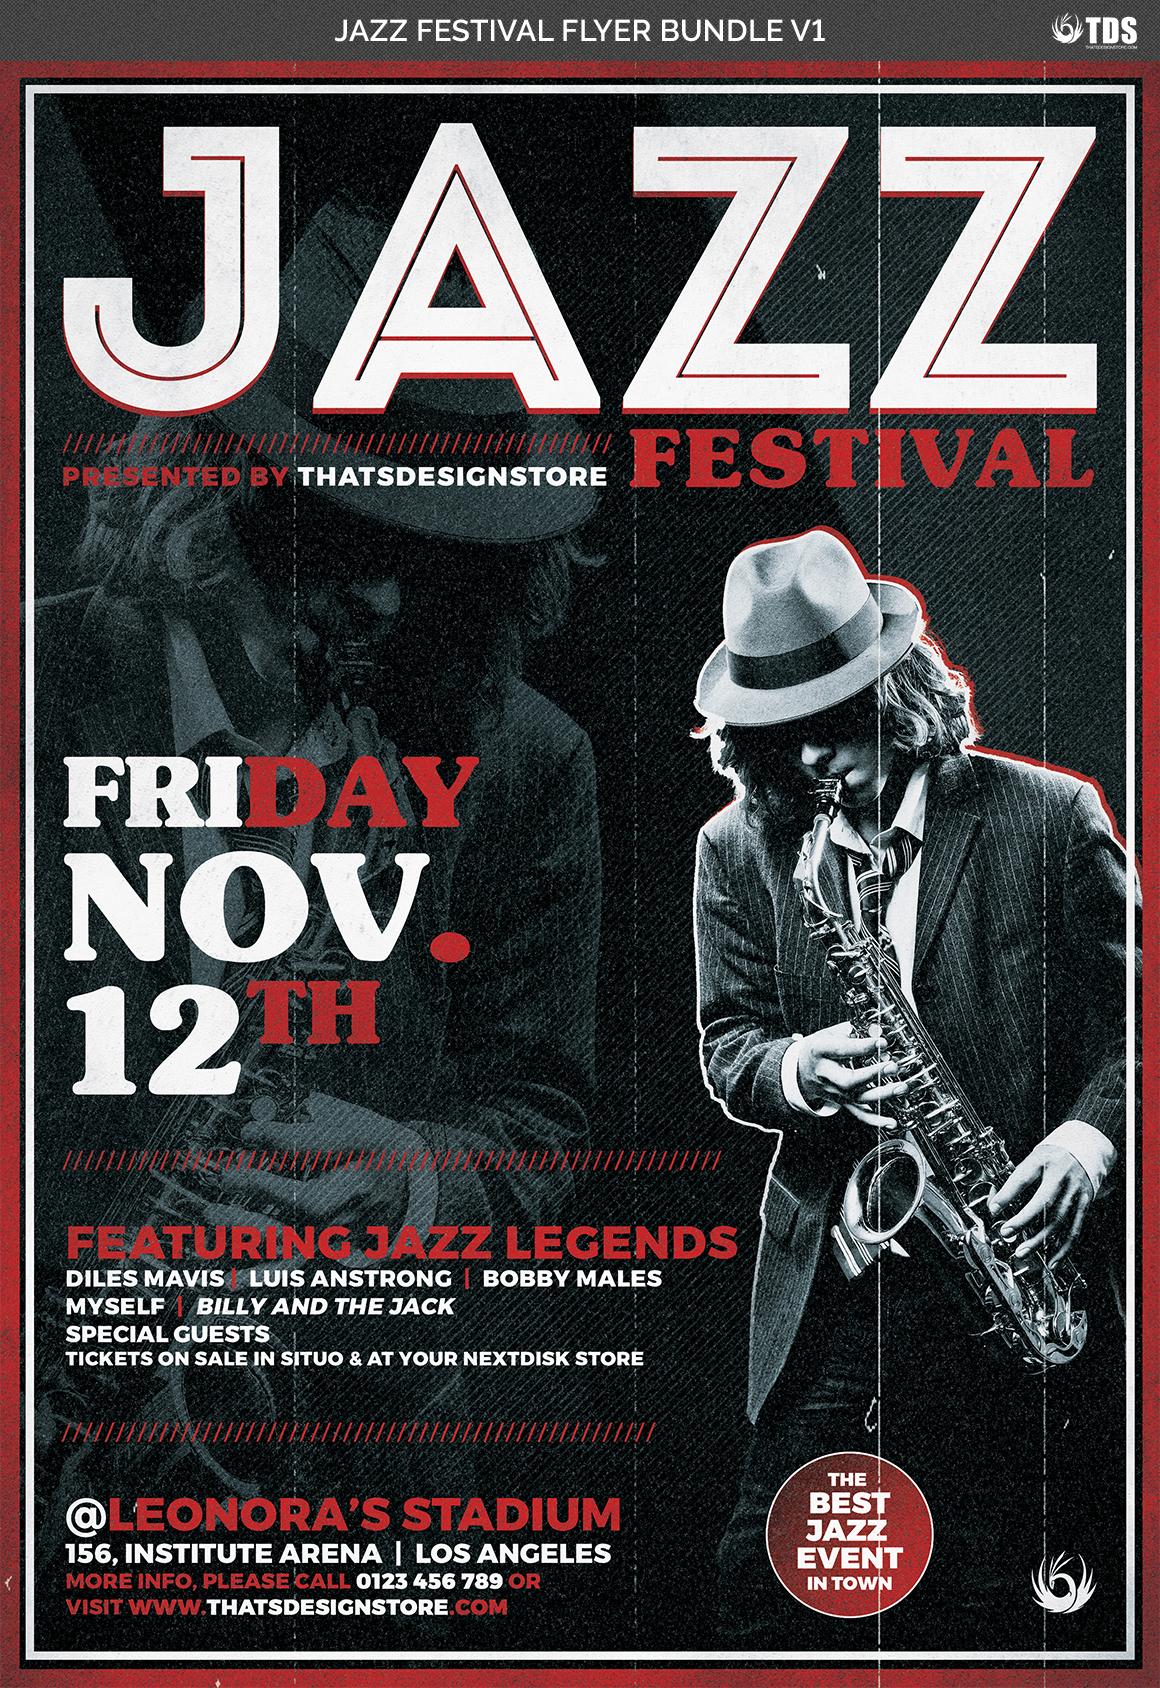 Jazz Festival Flyer Bundle V1 example image 2